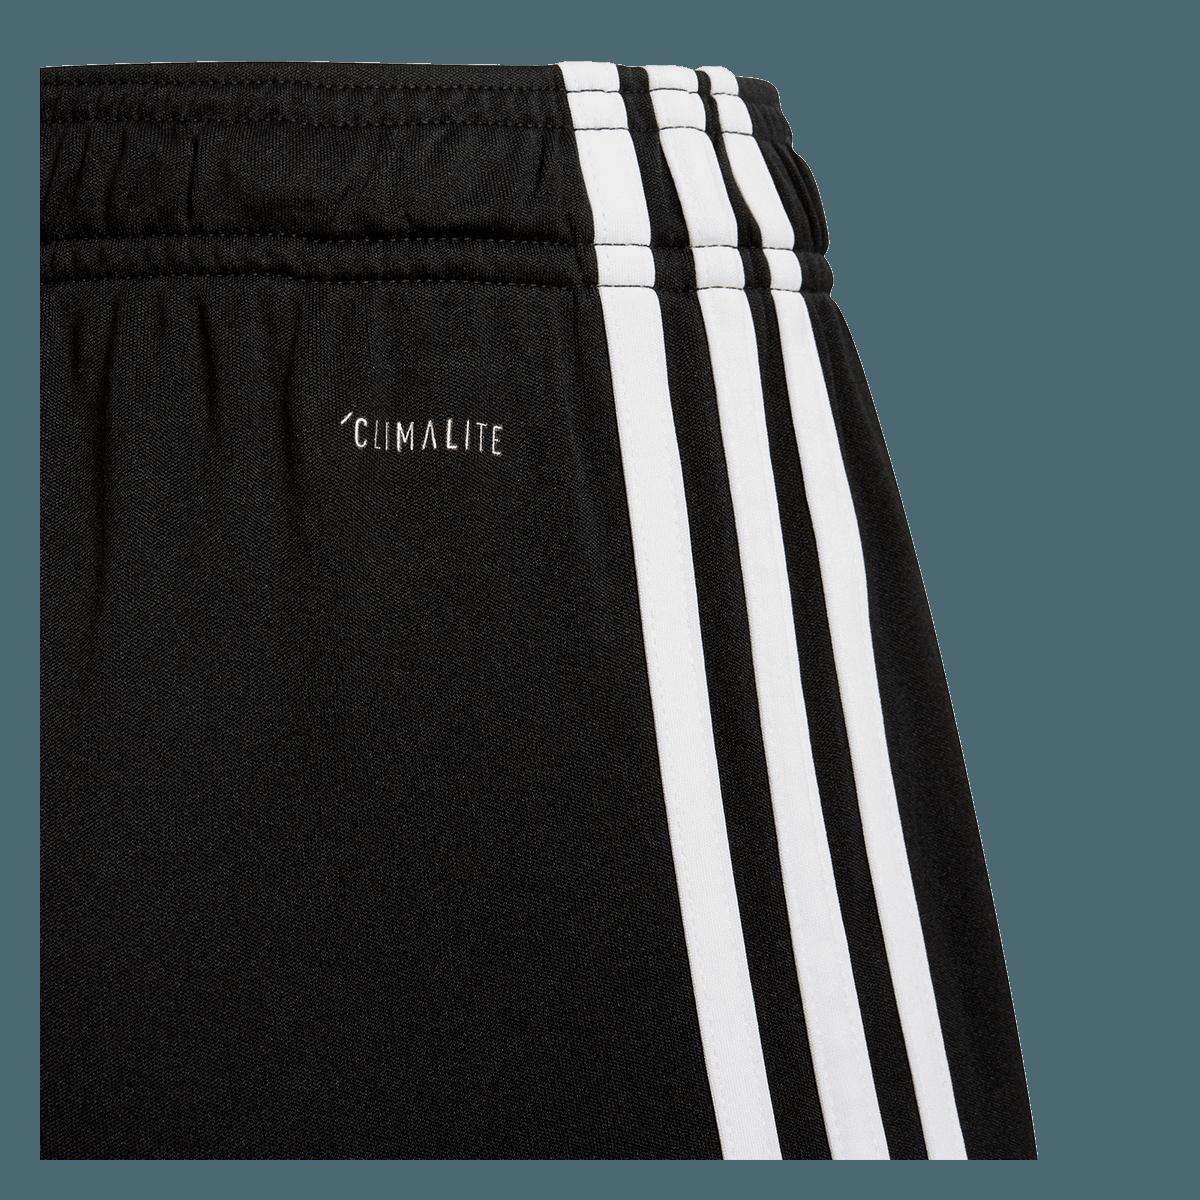 Adidas Junventus Shorts Kinder ab 23,82 € | Preisvergleich